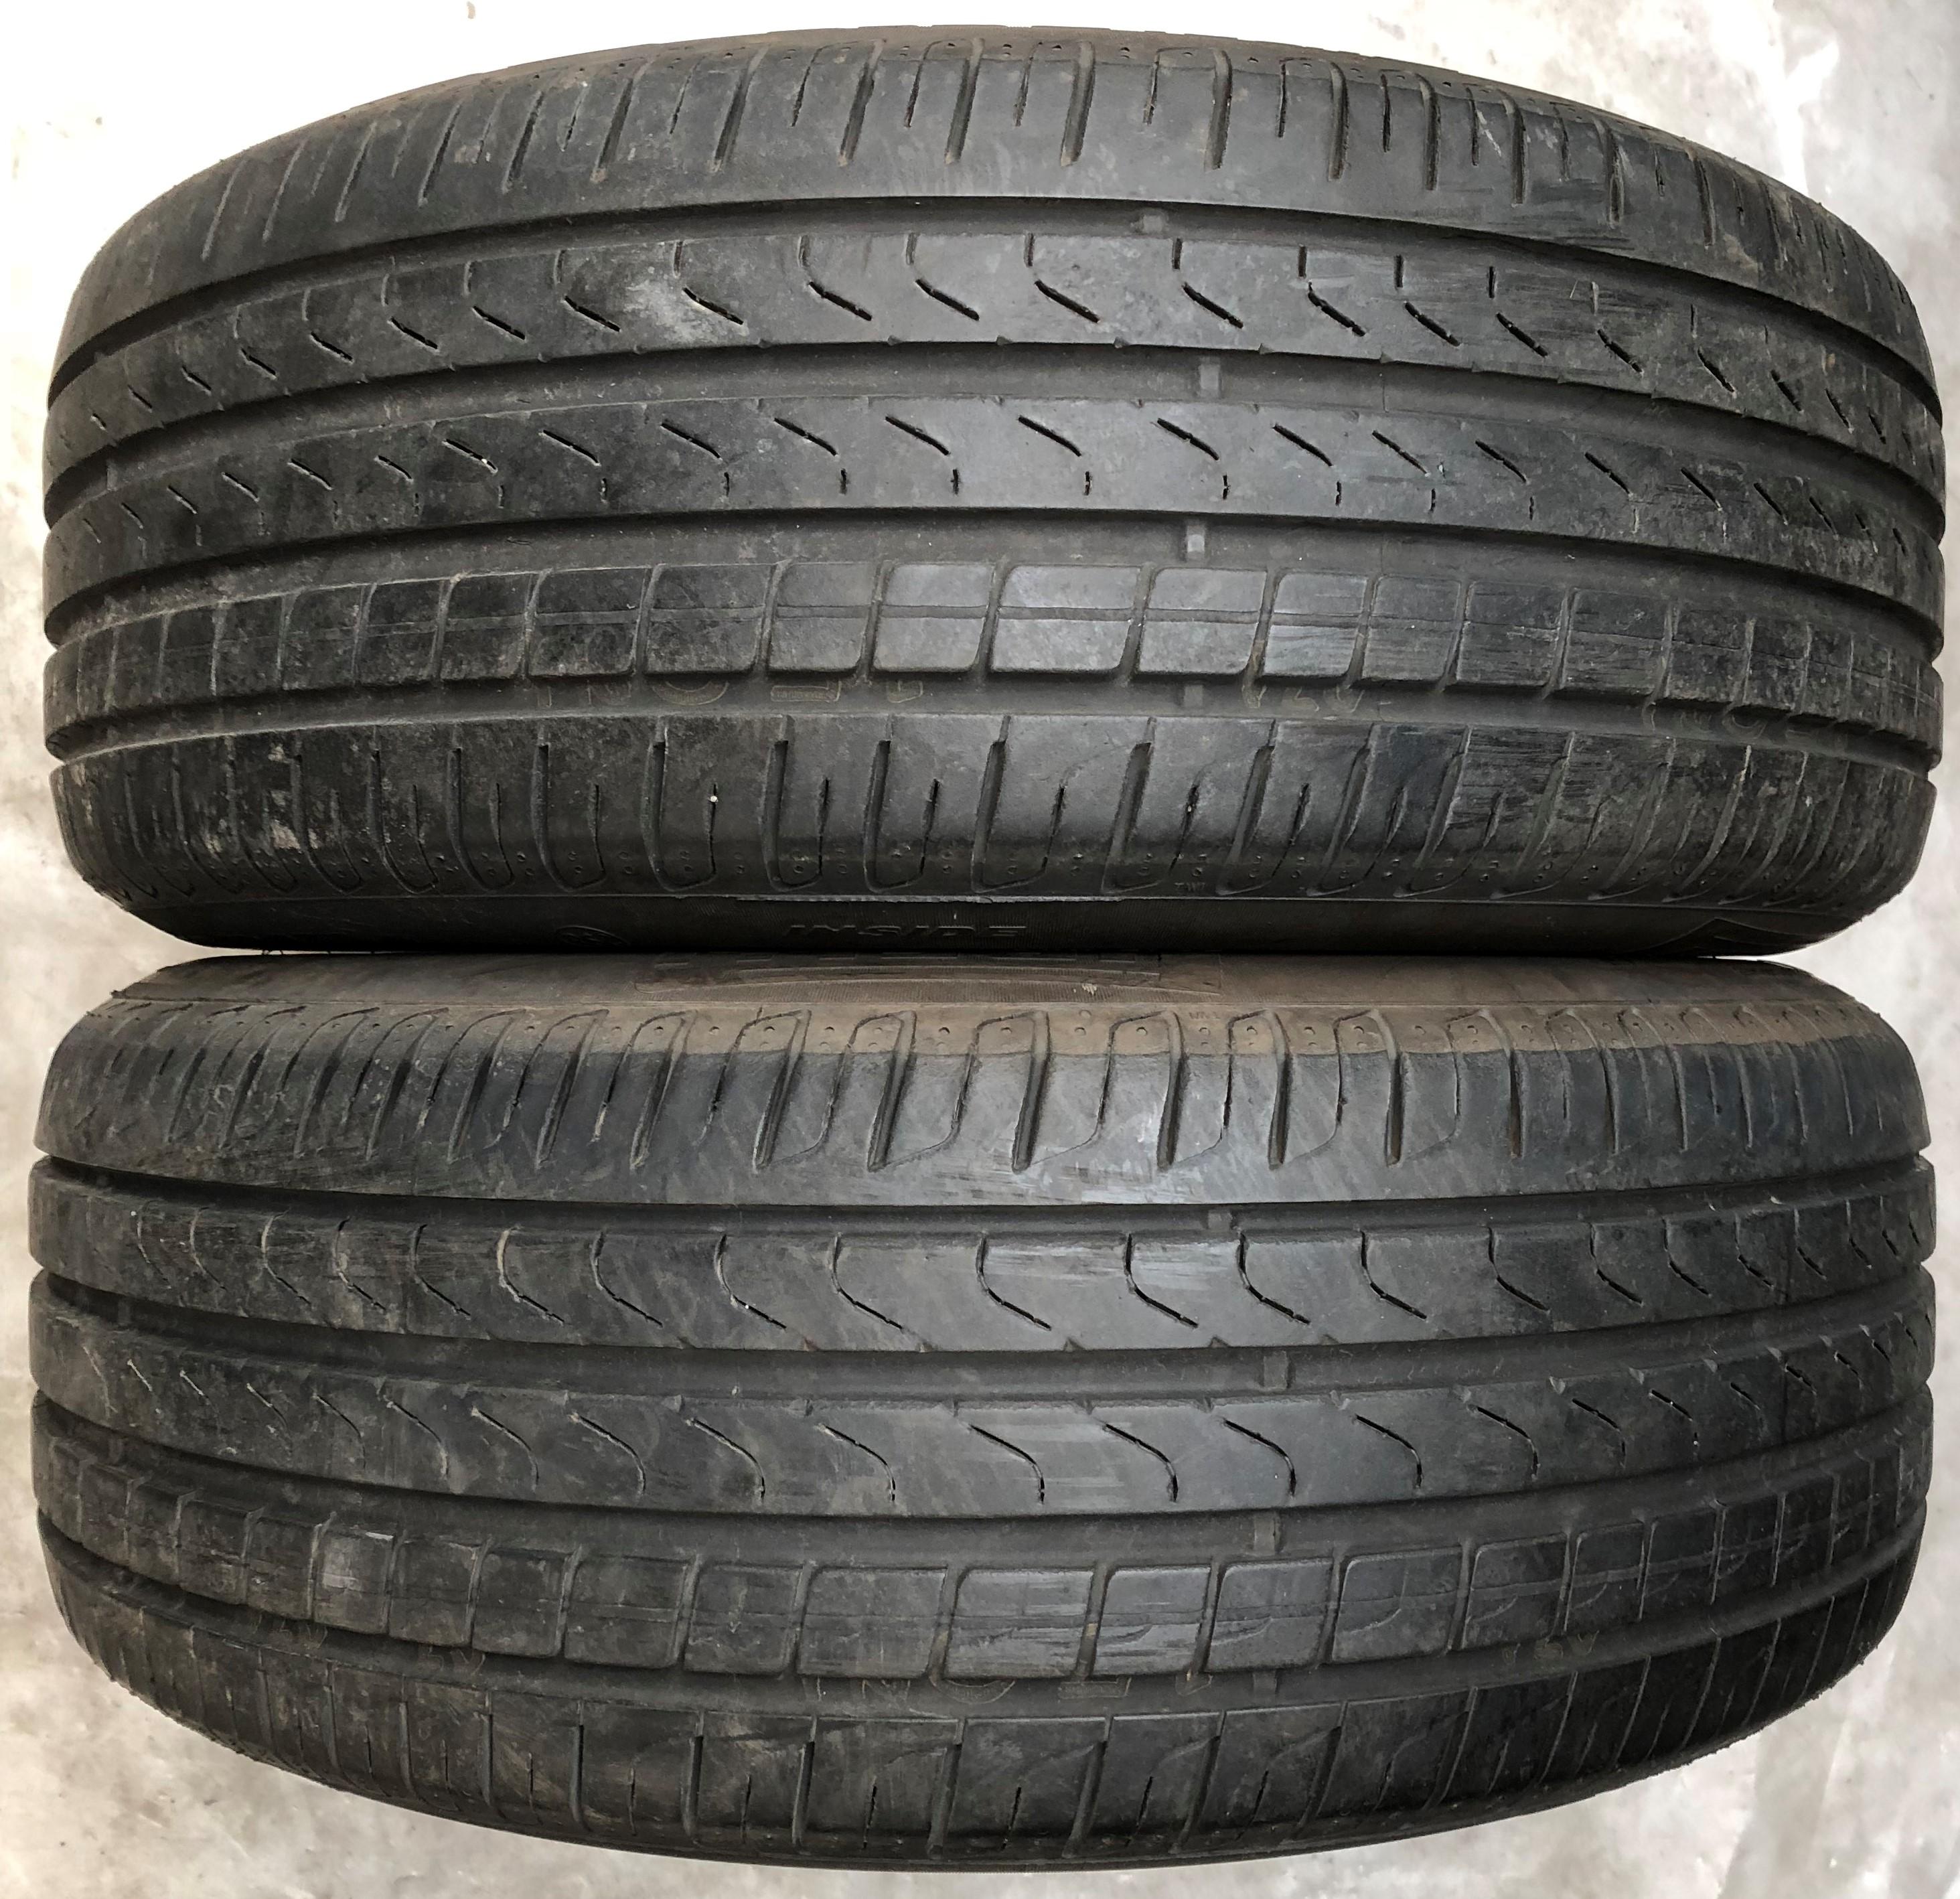 2 pneus d 39 t pirelli pirelli cinturato p7 rsc aiguis 225. Black Bedroom Furniture Sets. Home Design Ideas